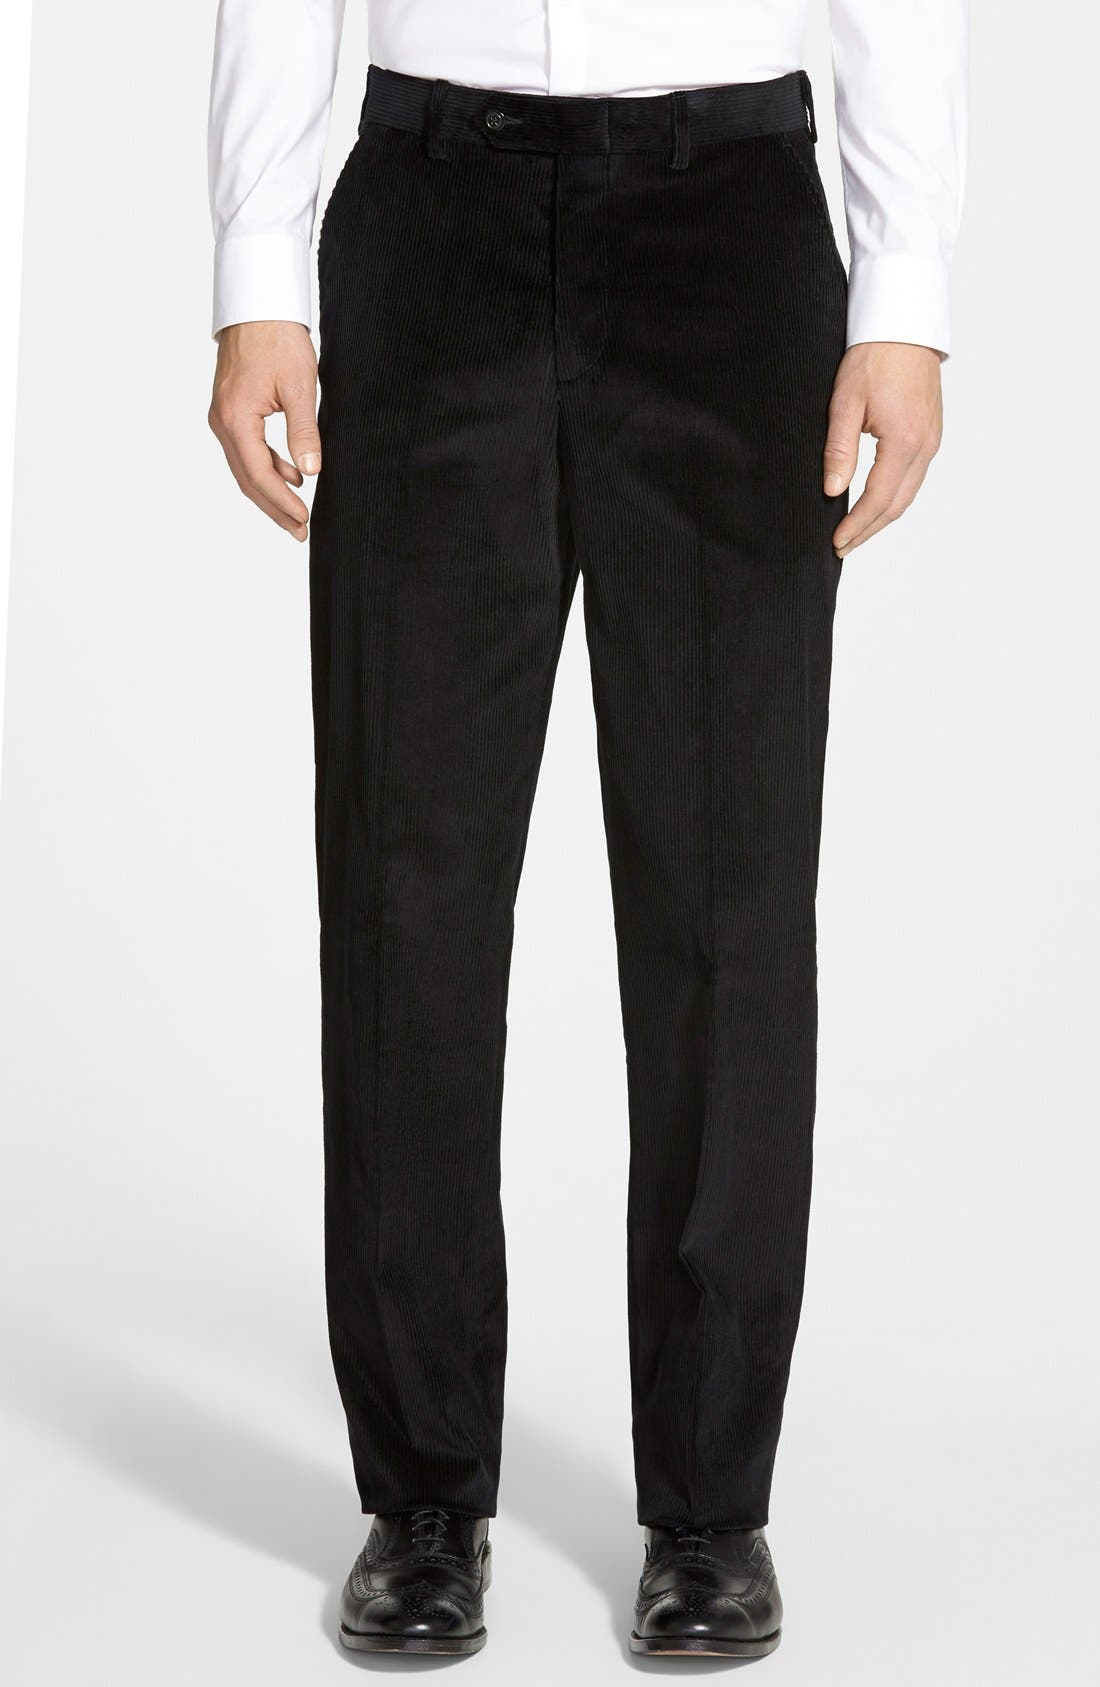 Black Corduroy Pants Mens qVQzBT9X